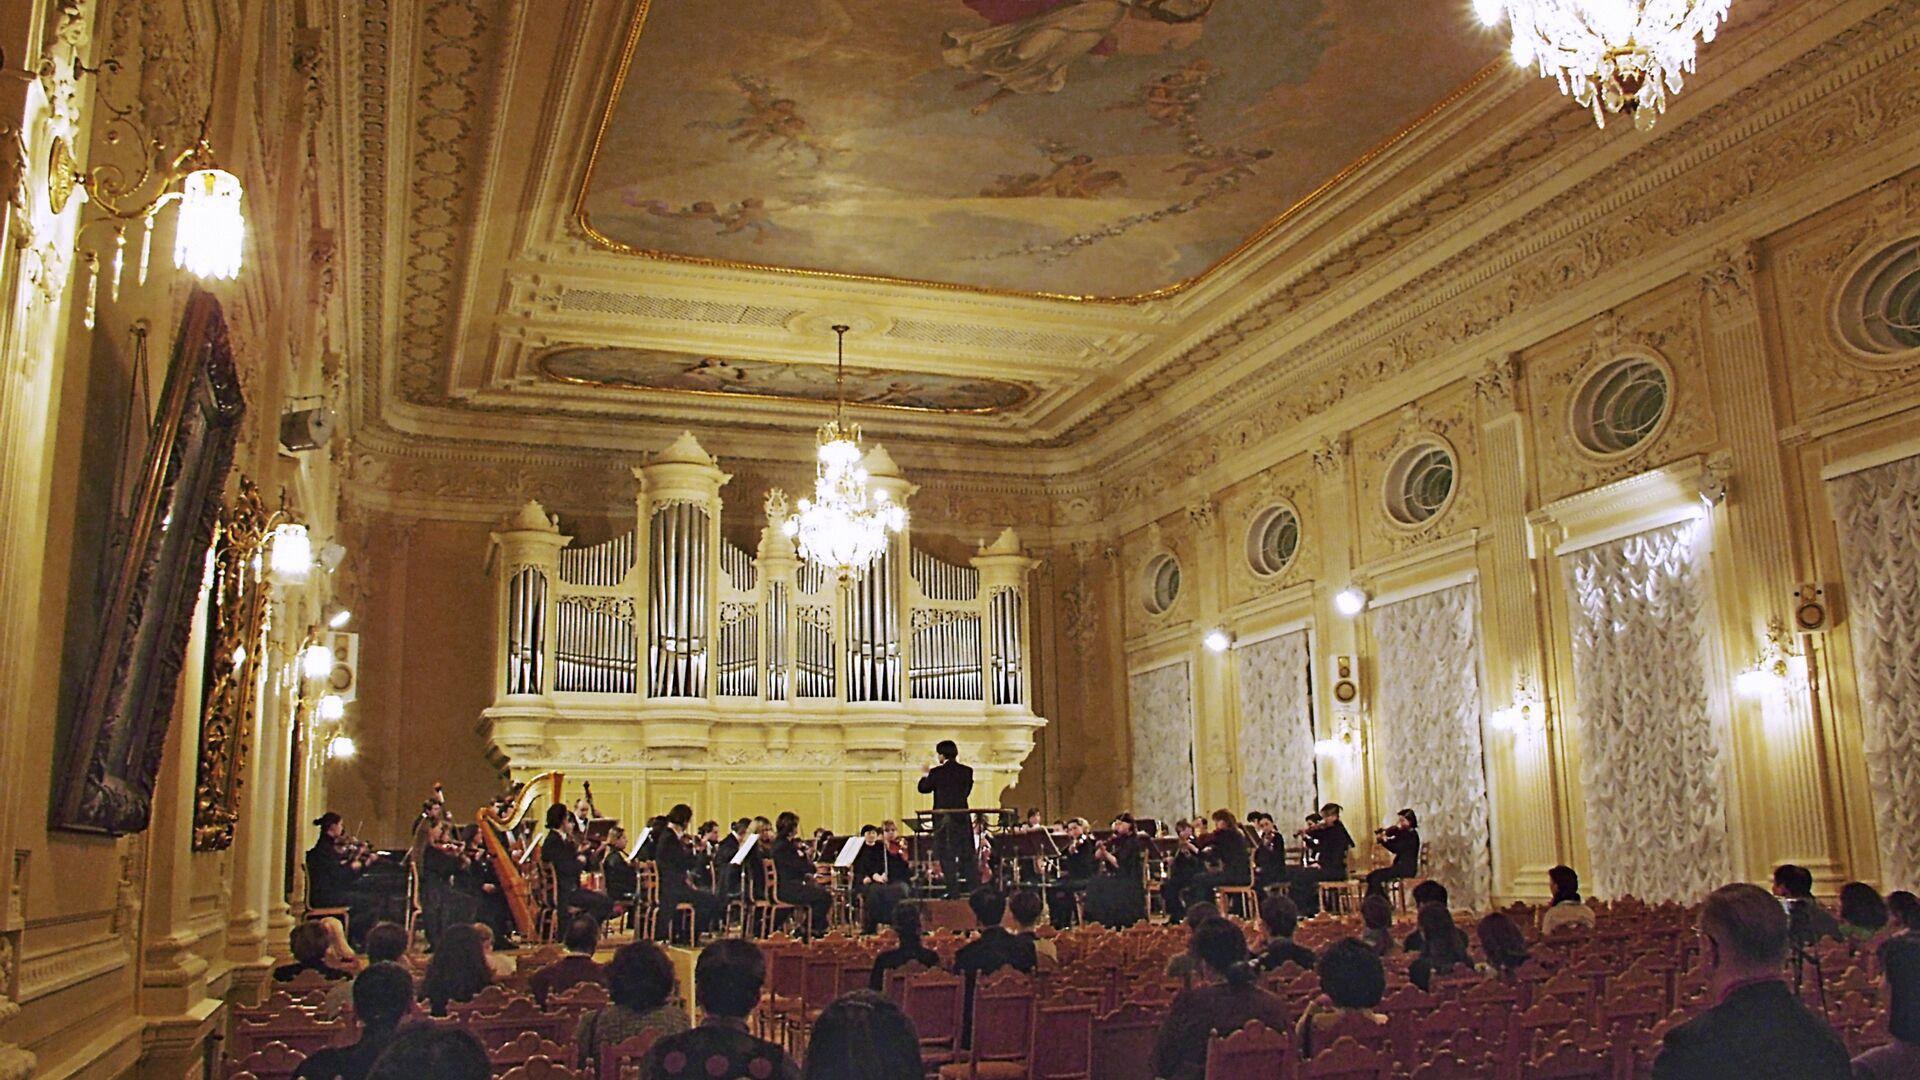 Зал в консерватории в Санкт-Петербурге - РИА Новости, 1920, 13.08.2020